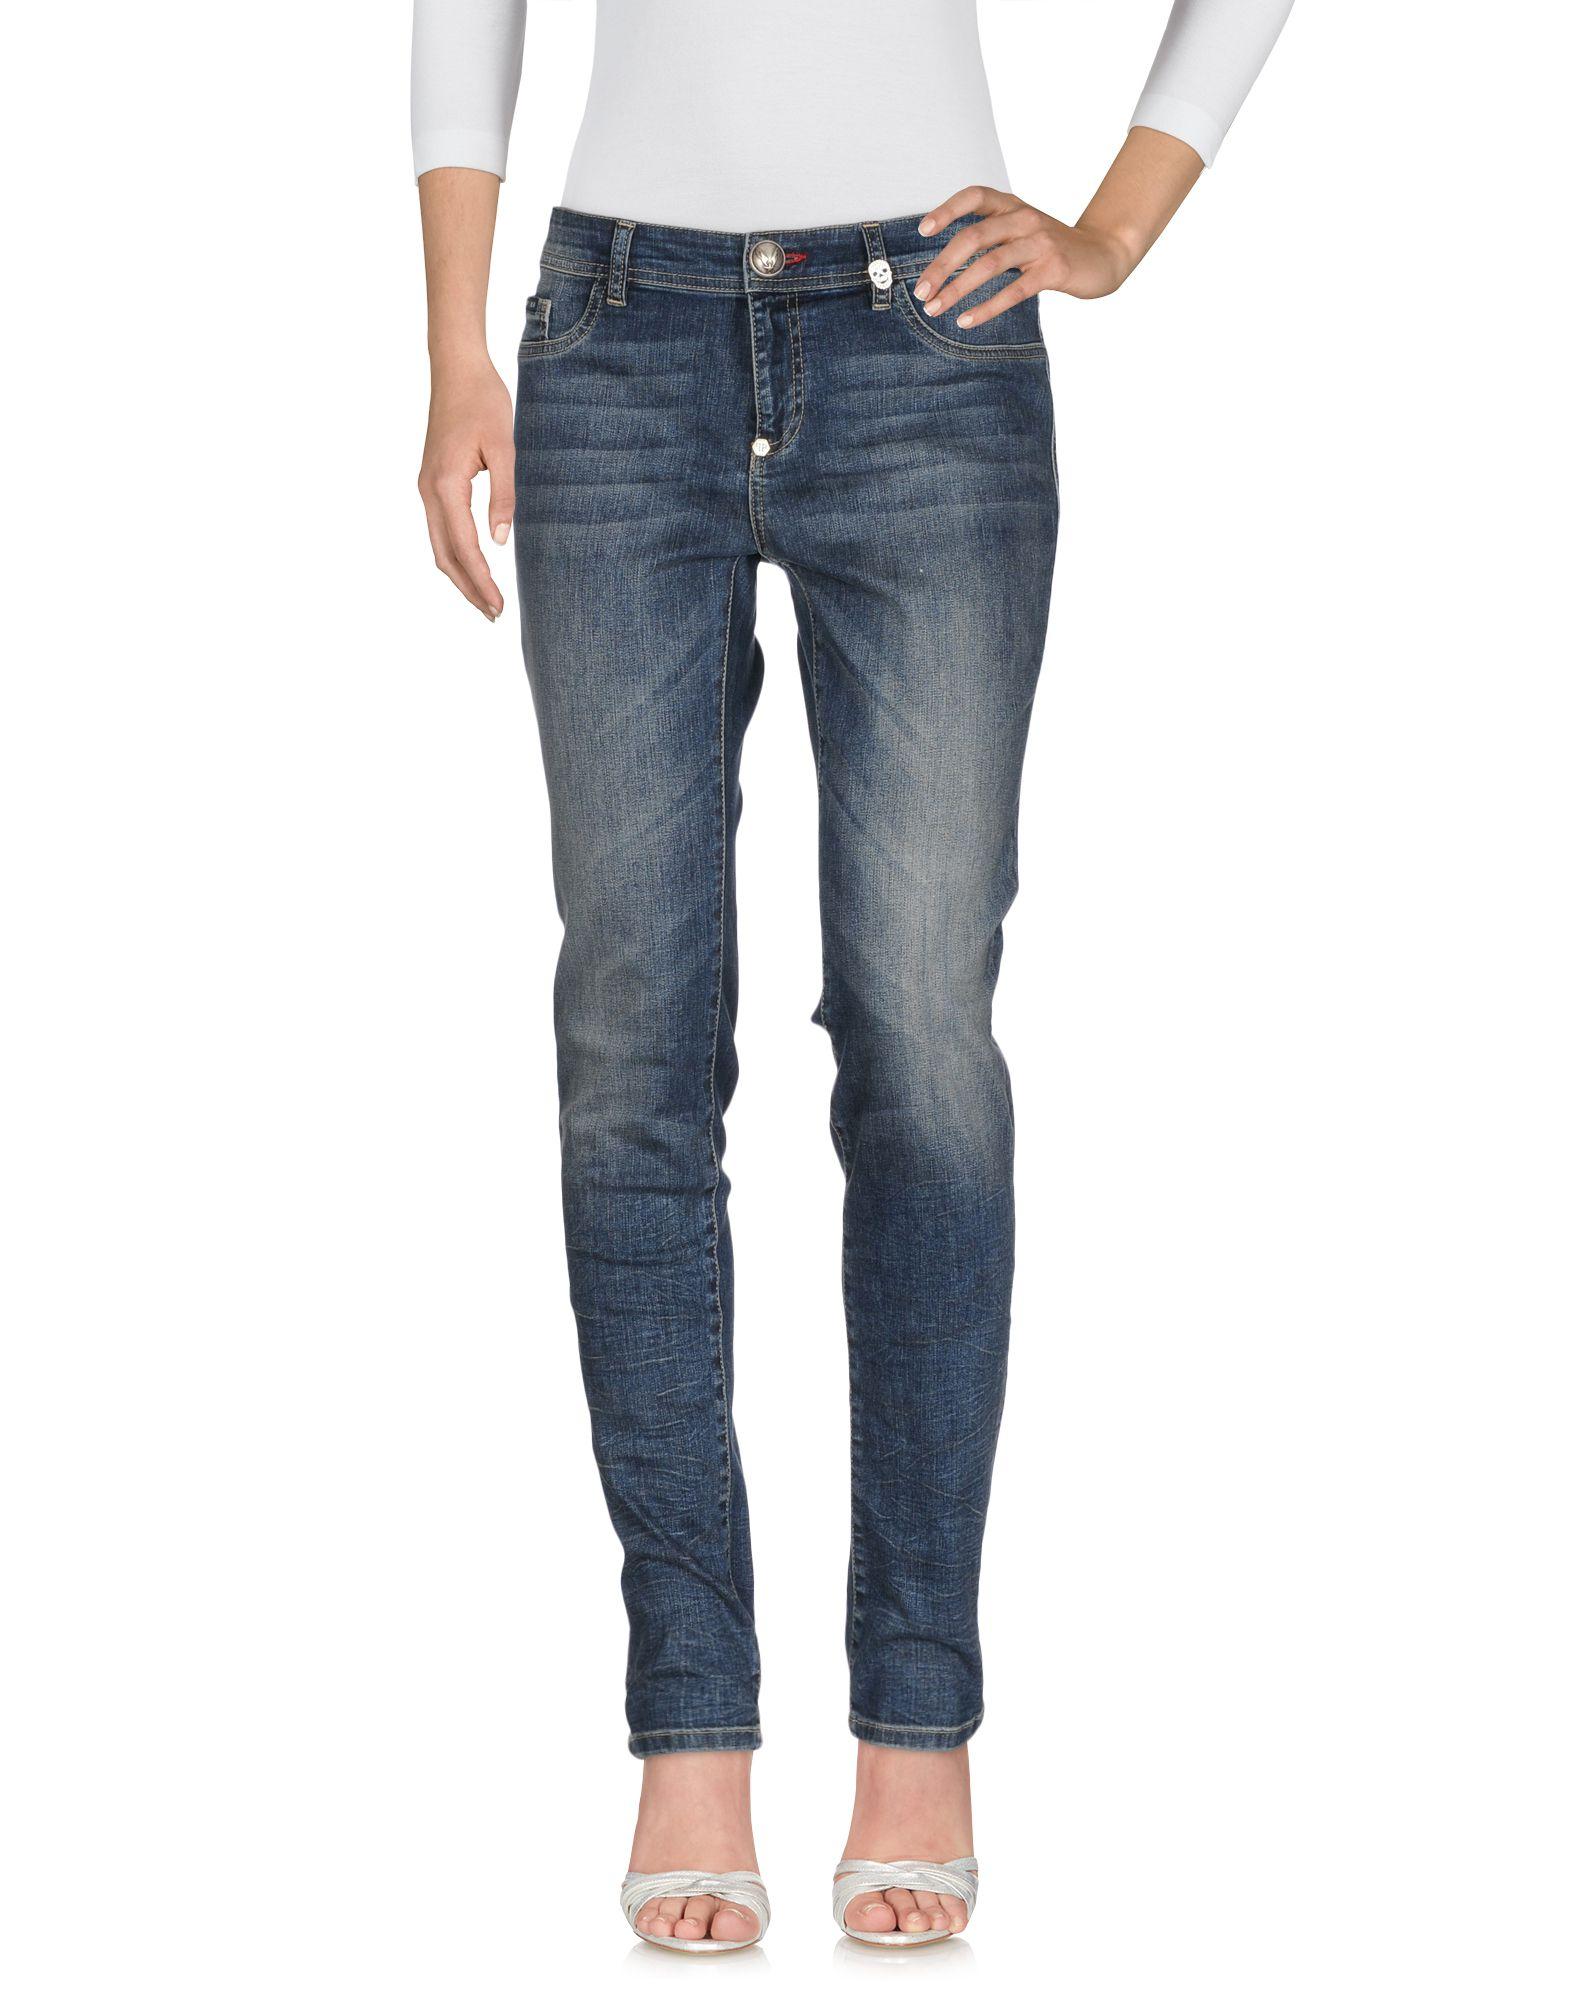 Pantaloni Jeans Philipp Plein Donna - Acquista online su 9ug6L